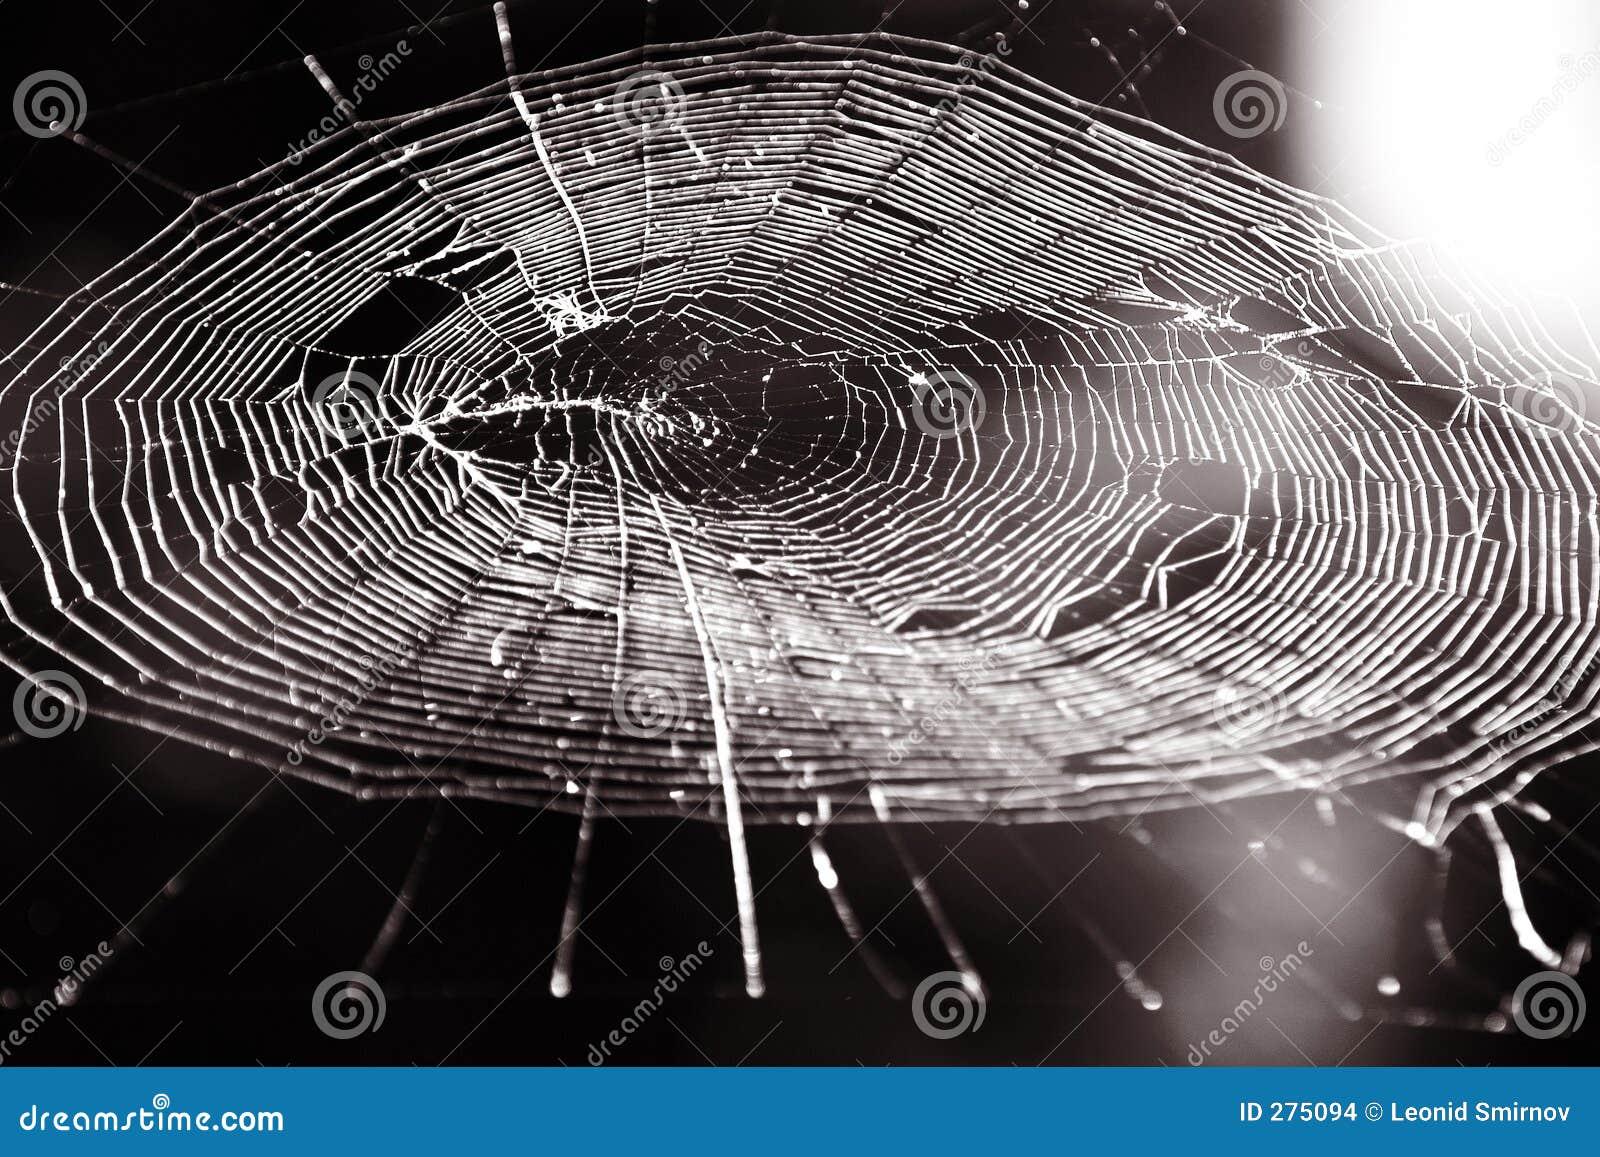 Spiders Web. Sepia